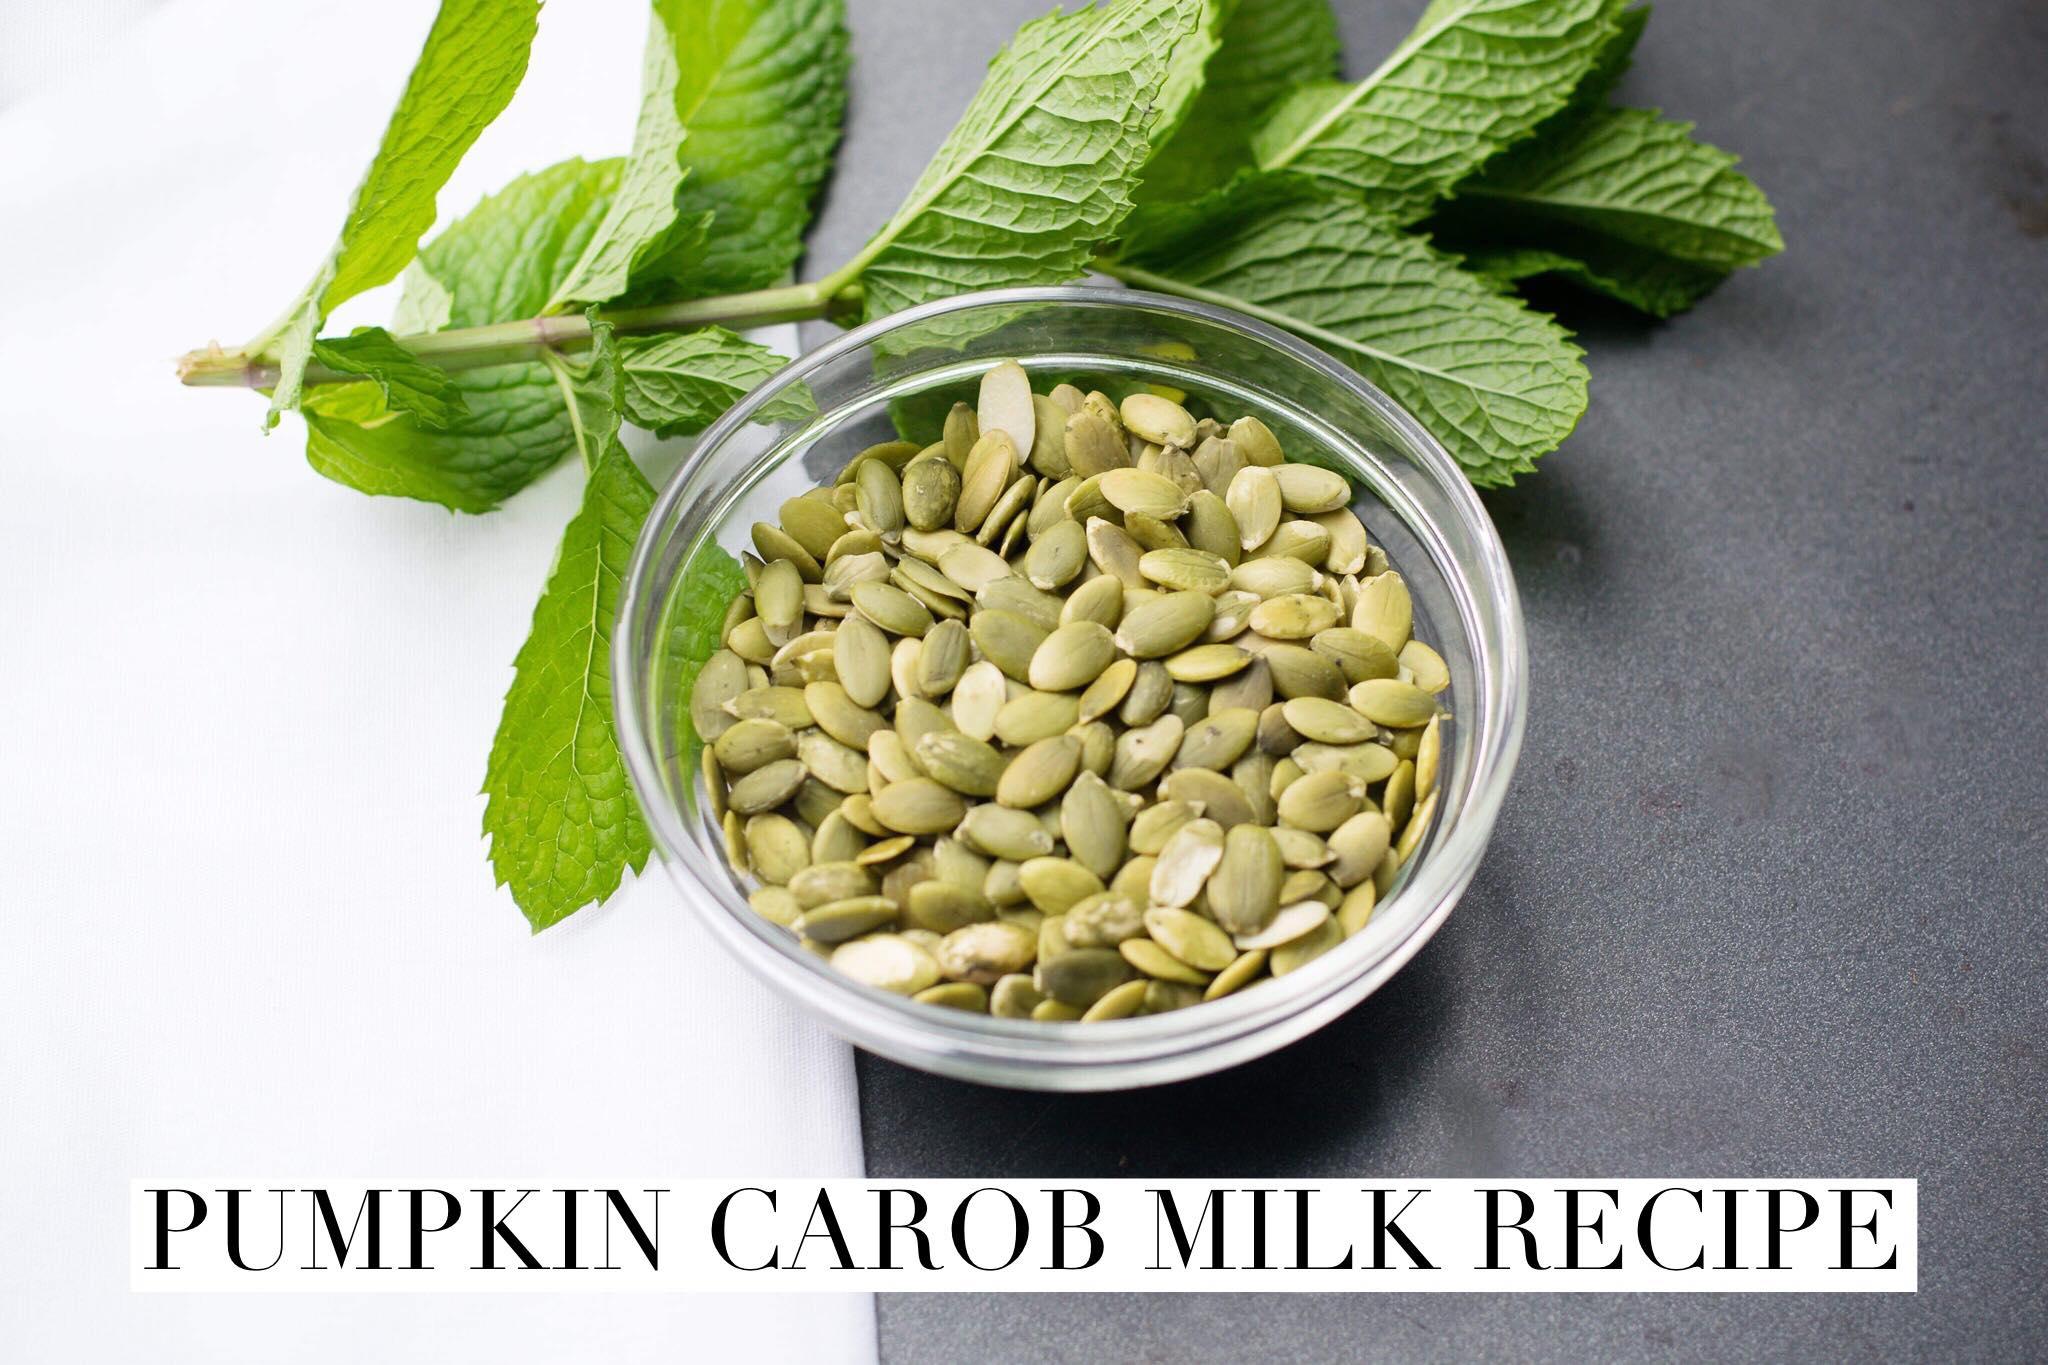 pumpkin carob milk recipe